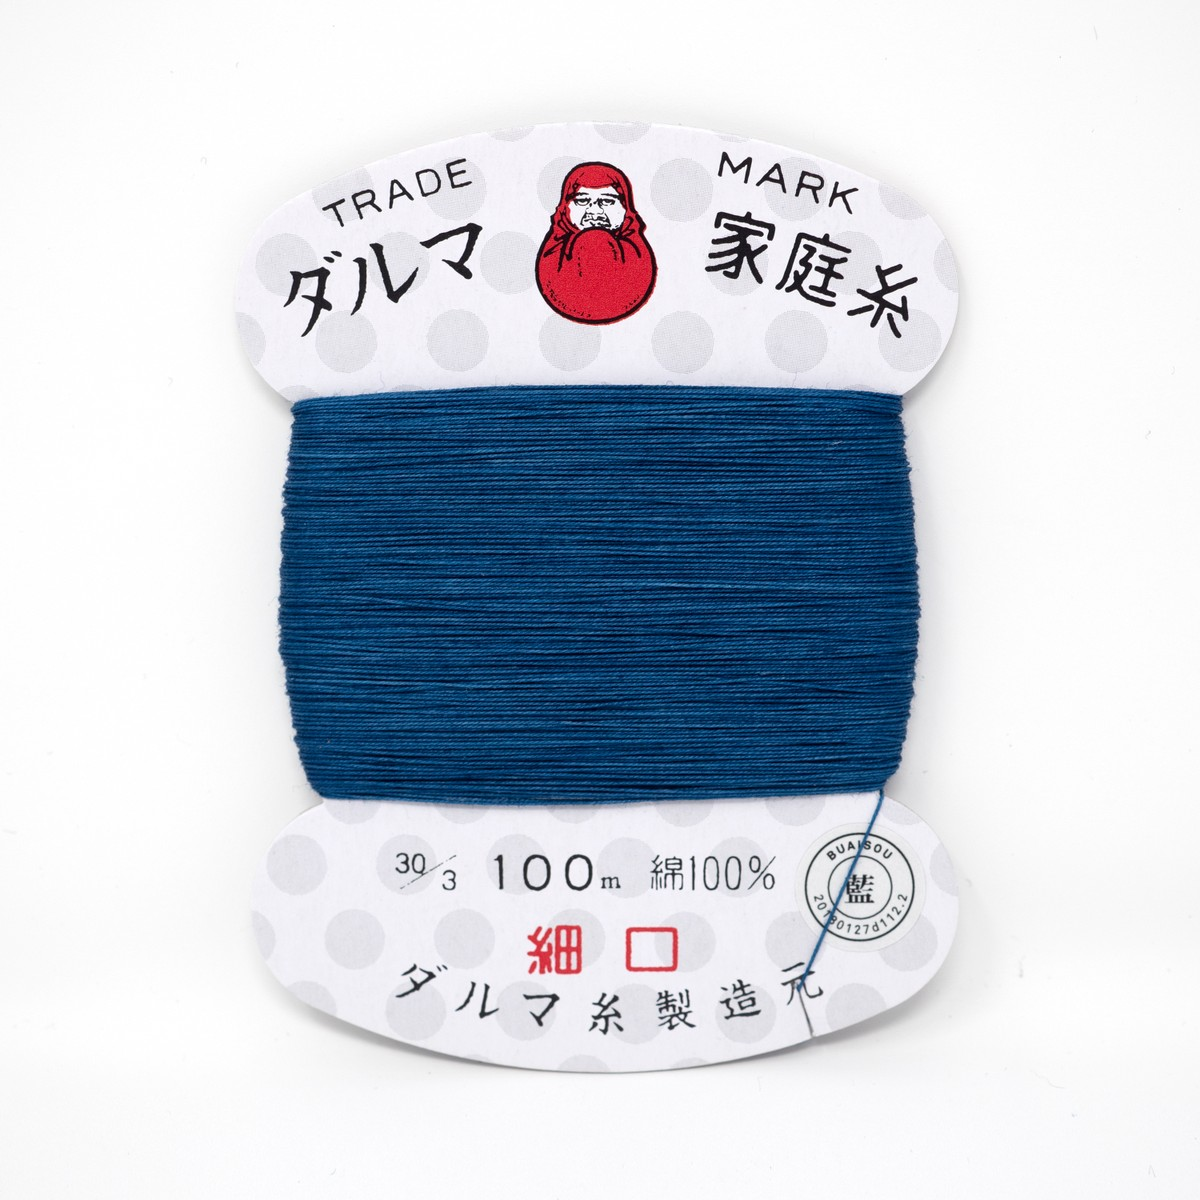 Photo of BUAISOU Sewing Thread: Medium Blue Indigo